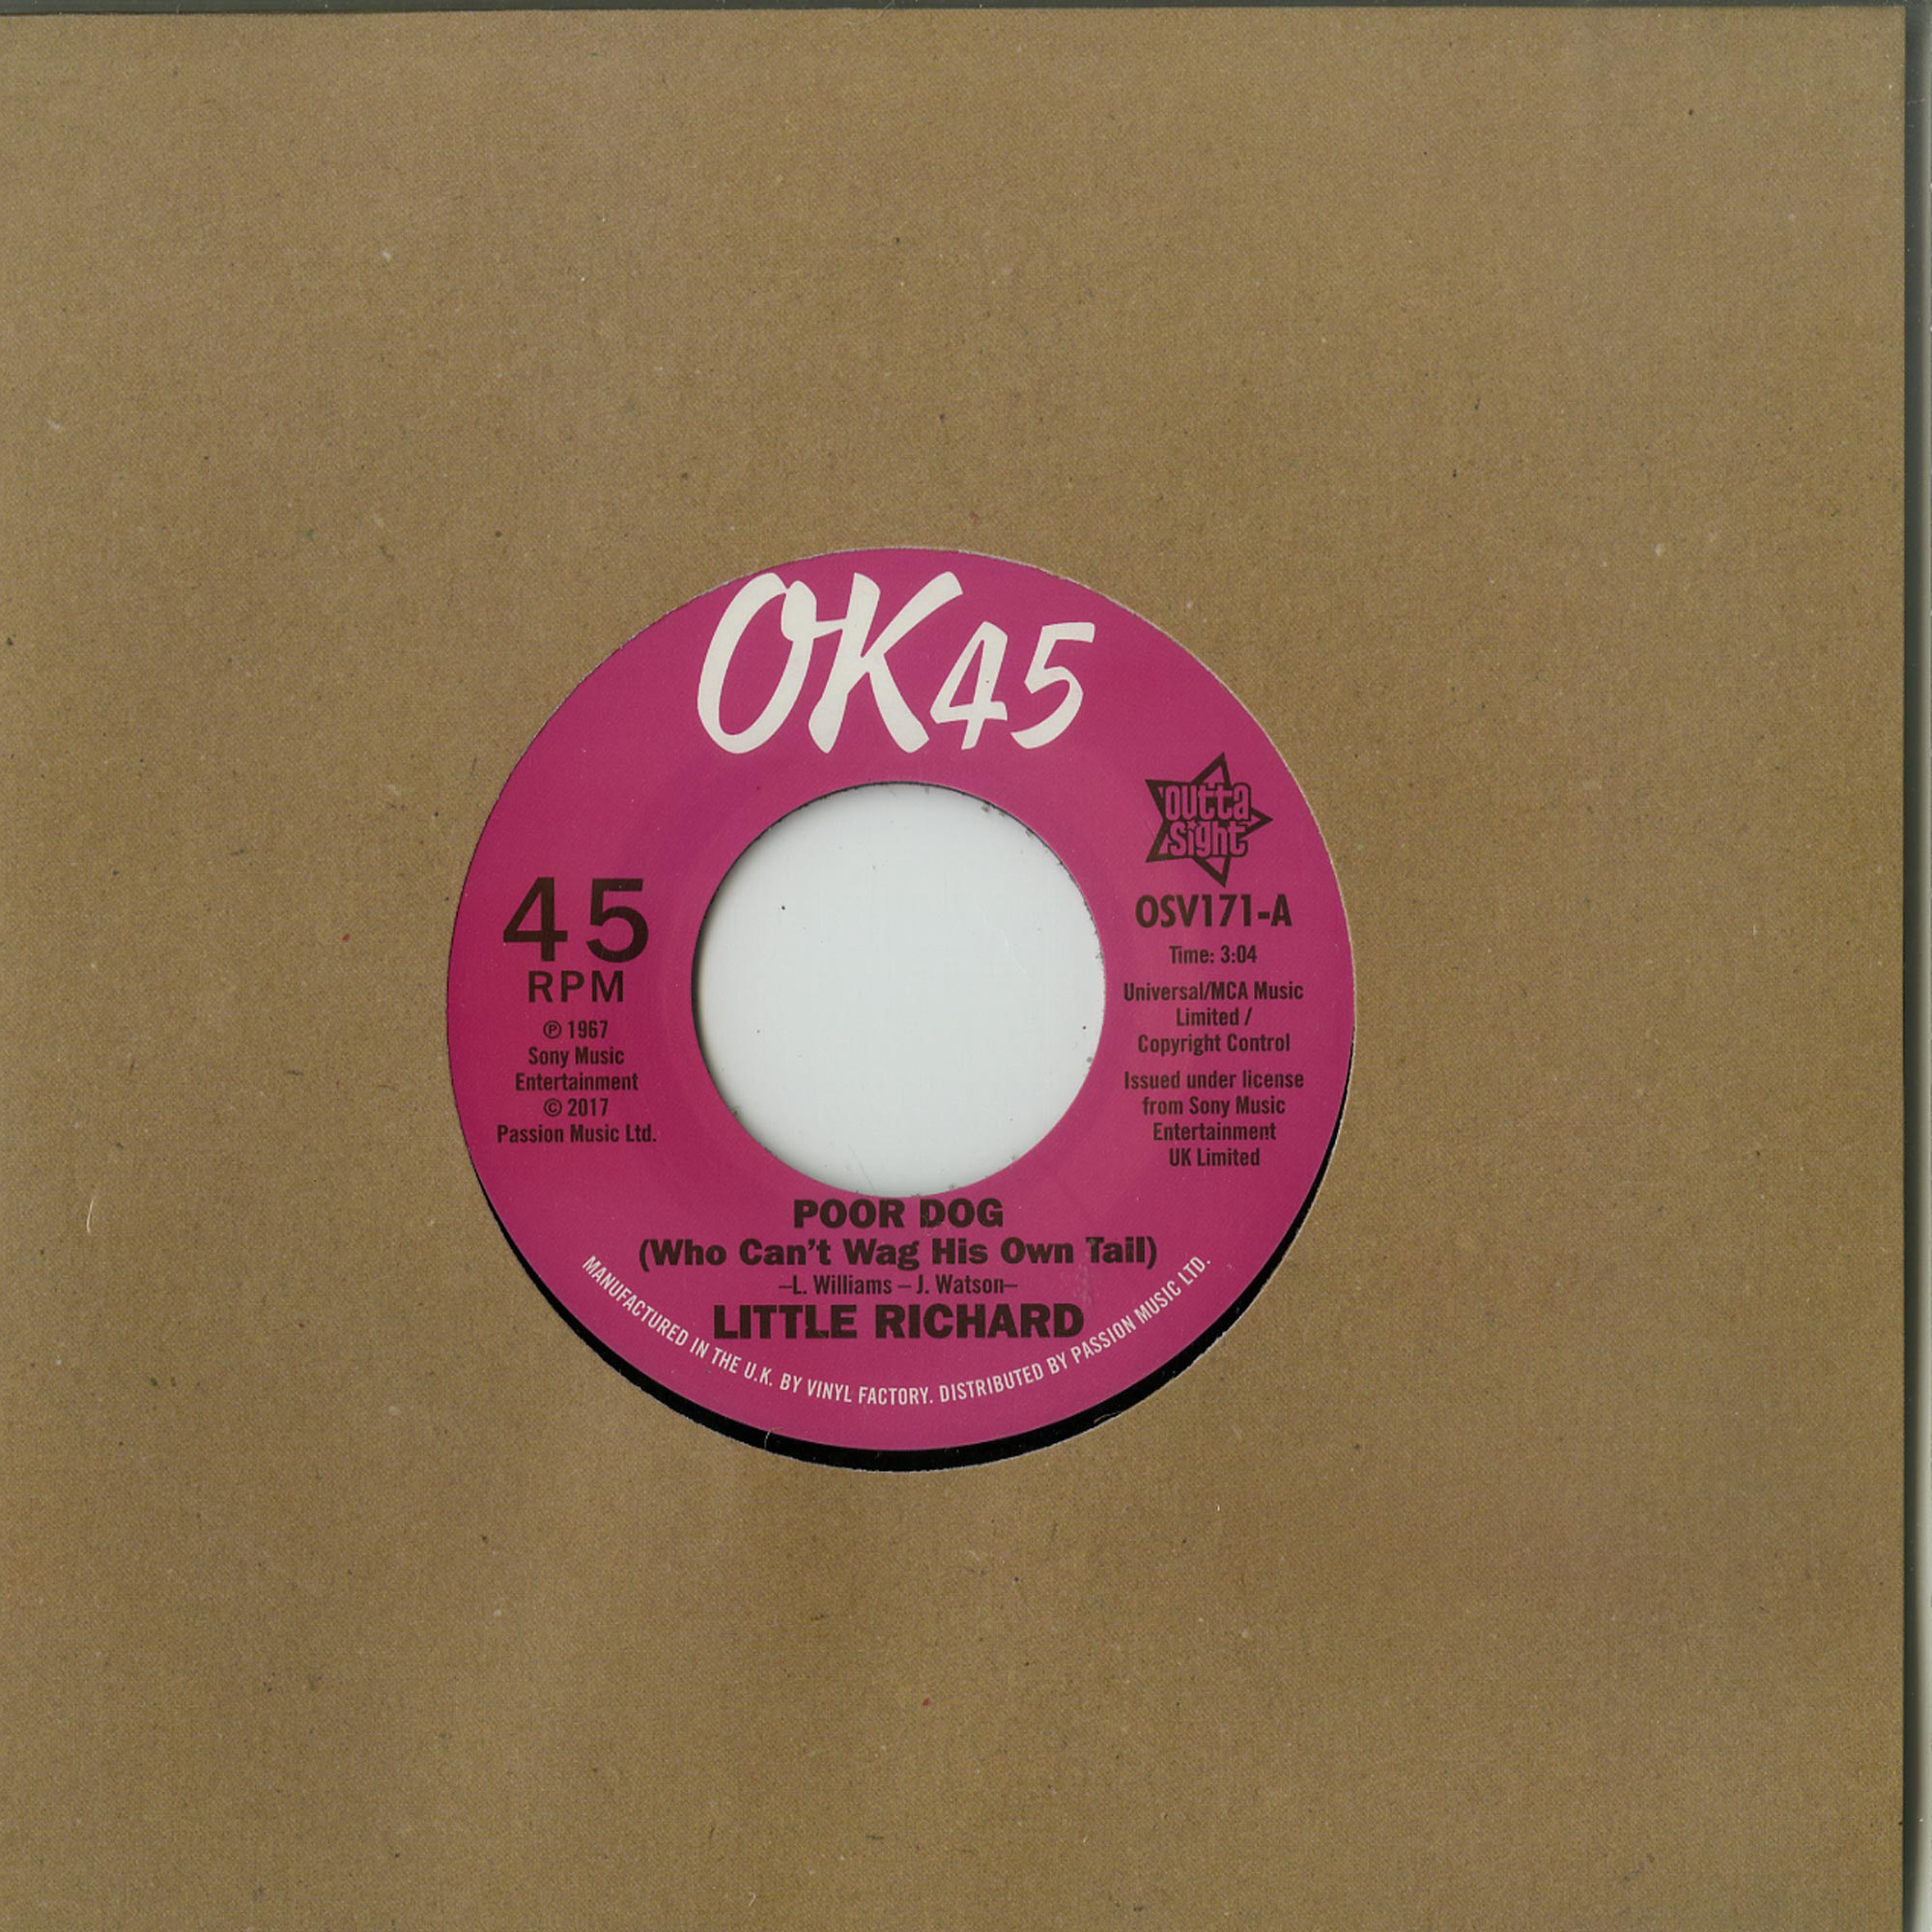 Little Richard - POOR DOG / A LITTLE BIT OF SOMETHING